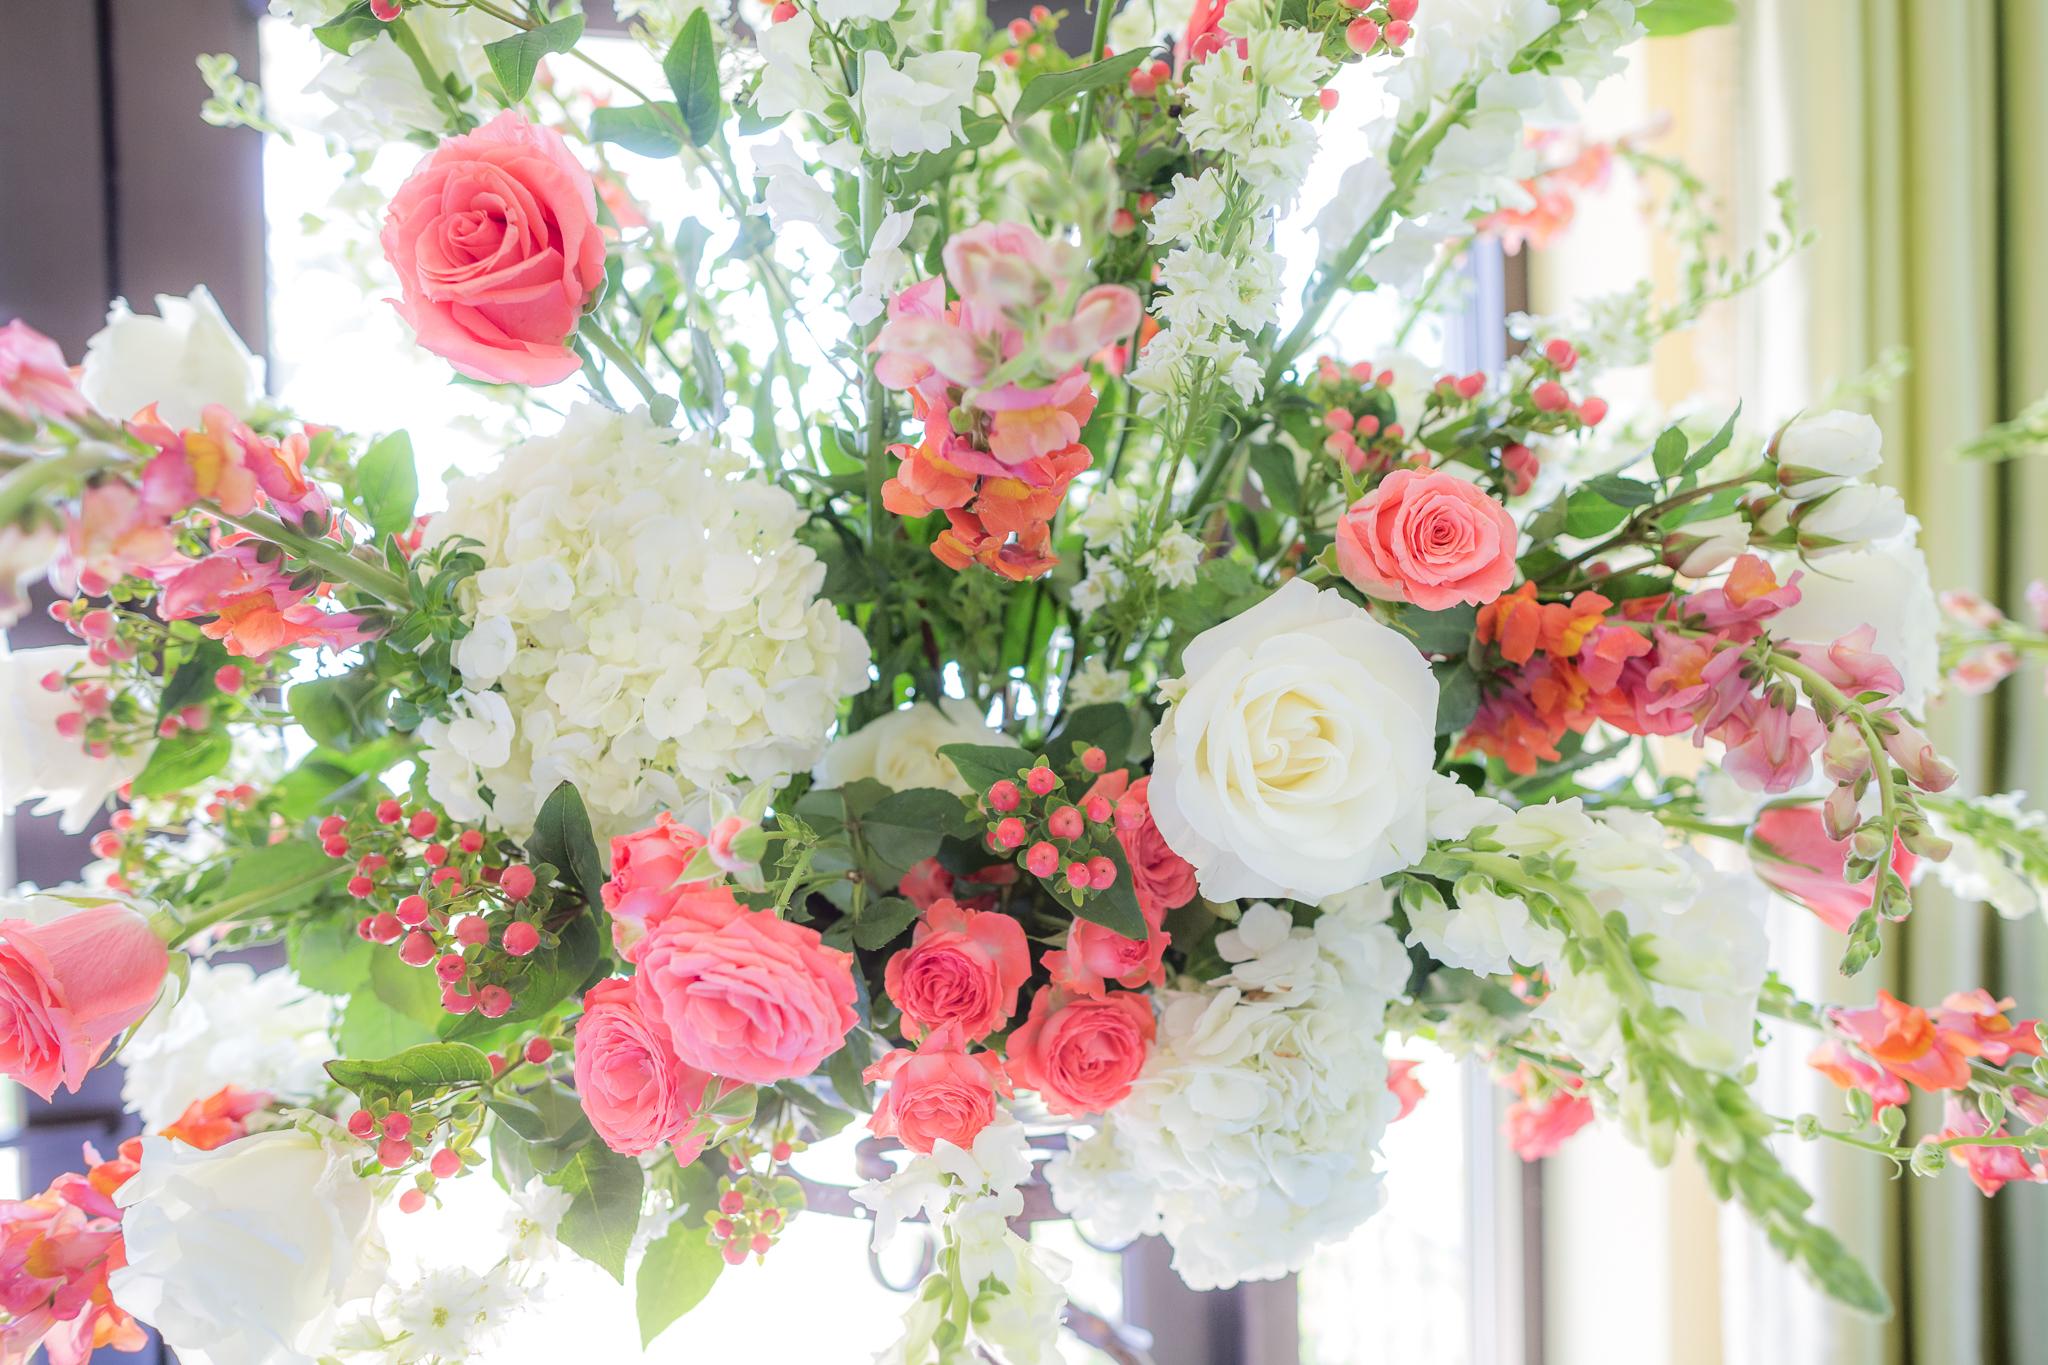 PaytonMaggie_Wedding_iWally_2015-3.jpg